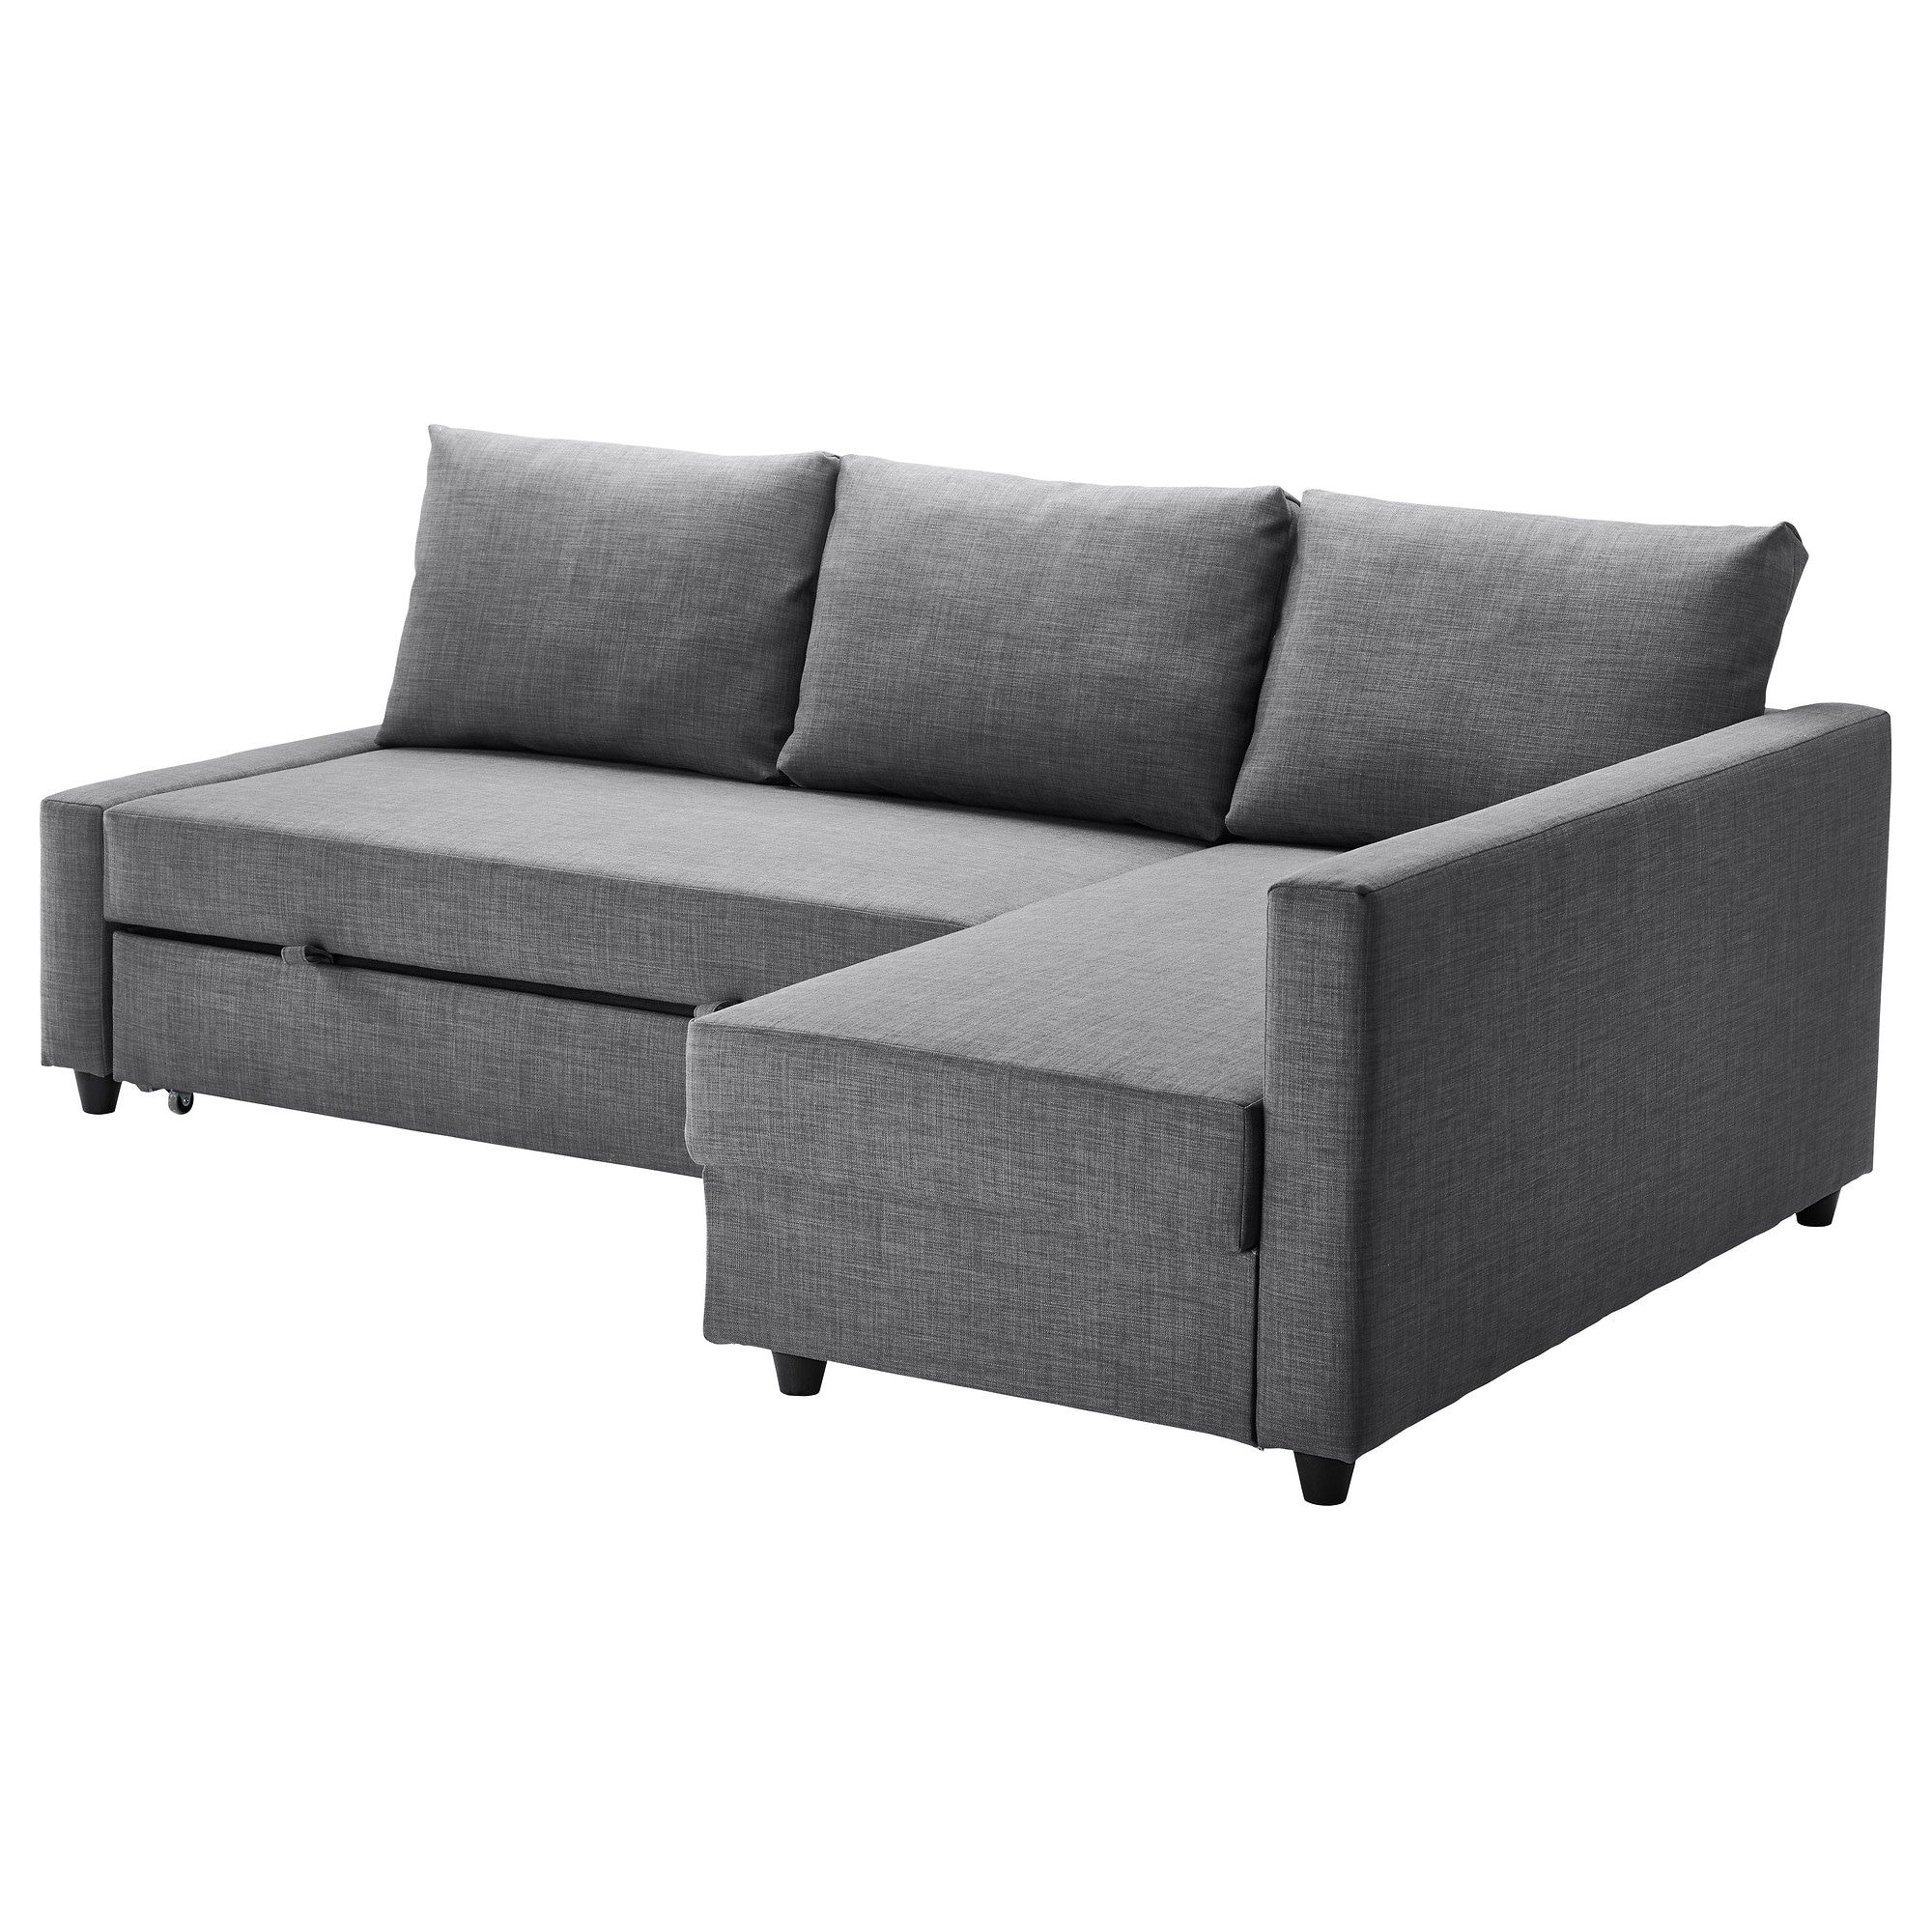 Ikea Friheten Corner Sofa Bed With Storage Skiftebo Dark Gray Sofa Bed With Storage Corner Sofa Bed With Storage Sofa Bed With Chaise